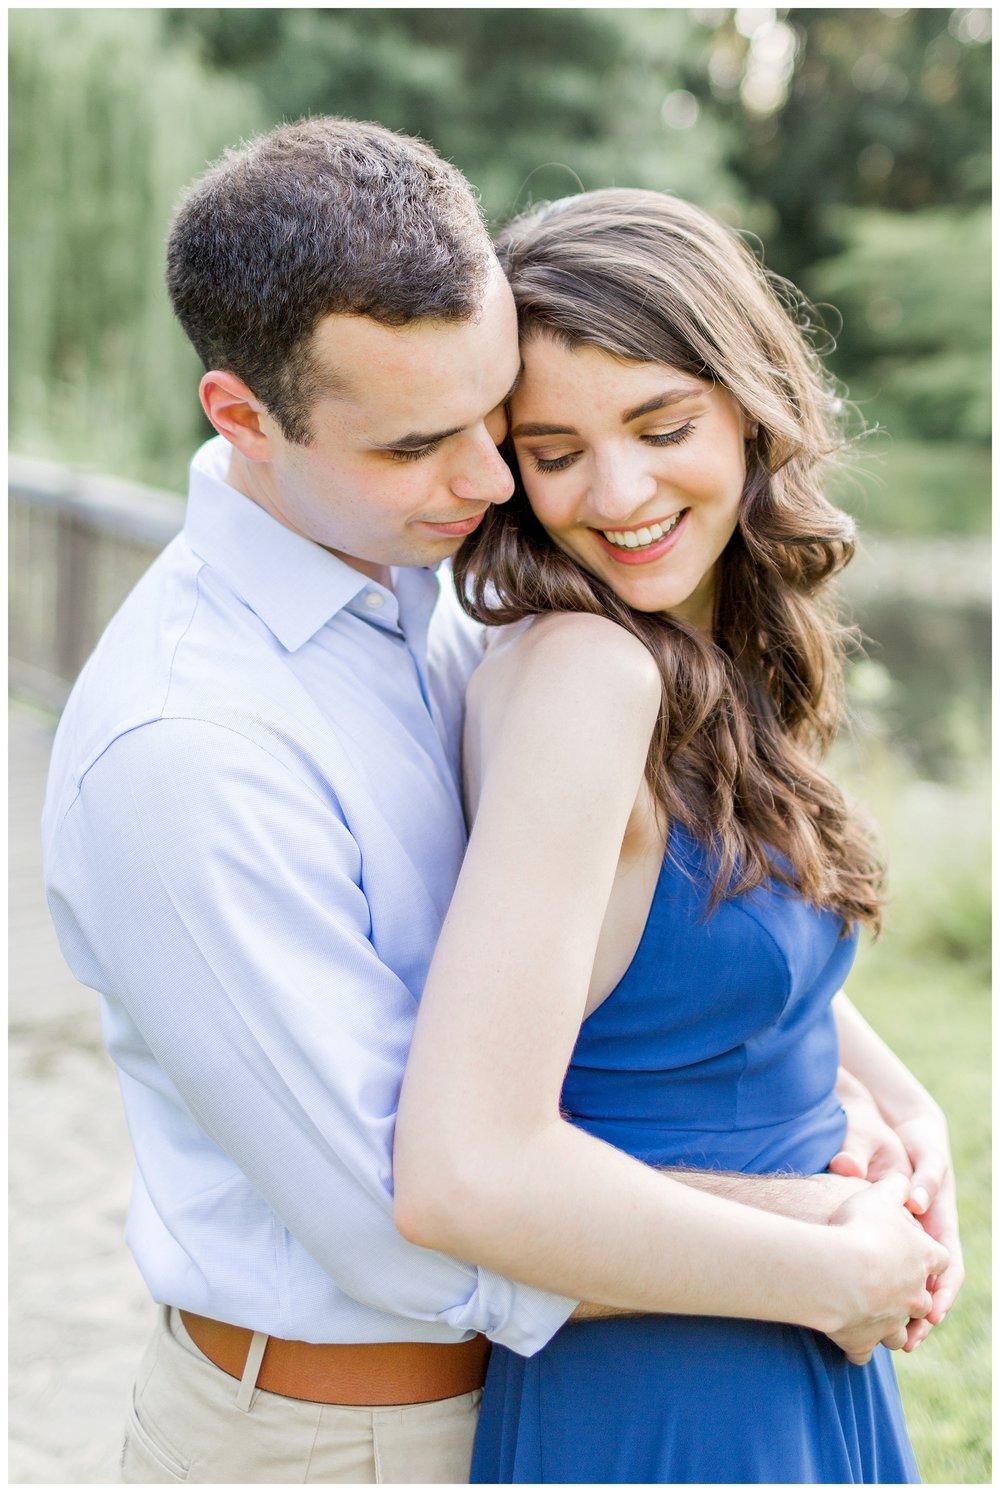 Meadowlark Botanical Garden Engagement | Virginia Wedding Photographer Kir Tuben_0001.jpg